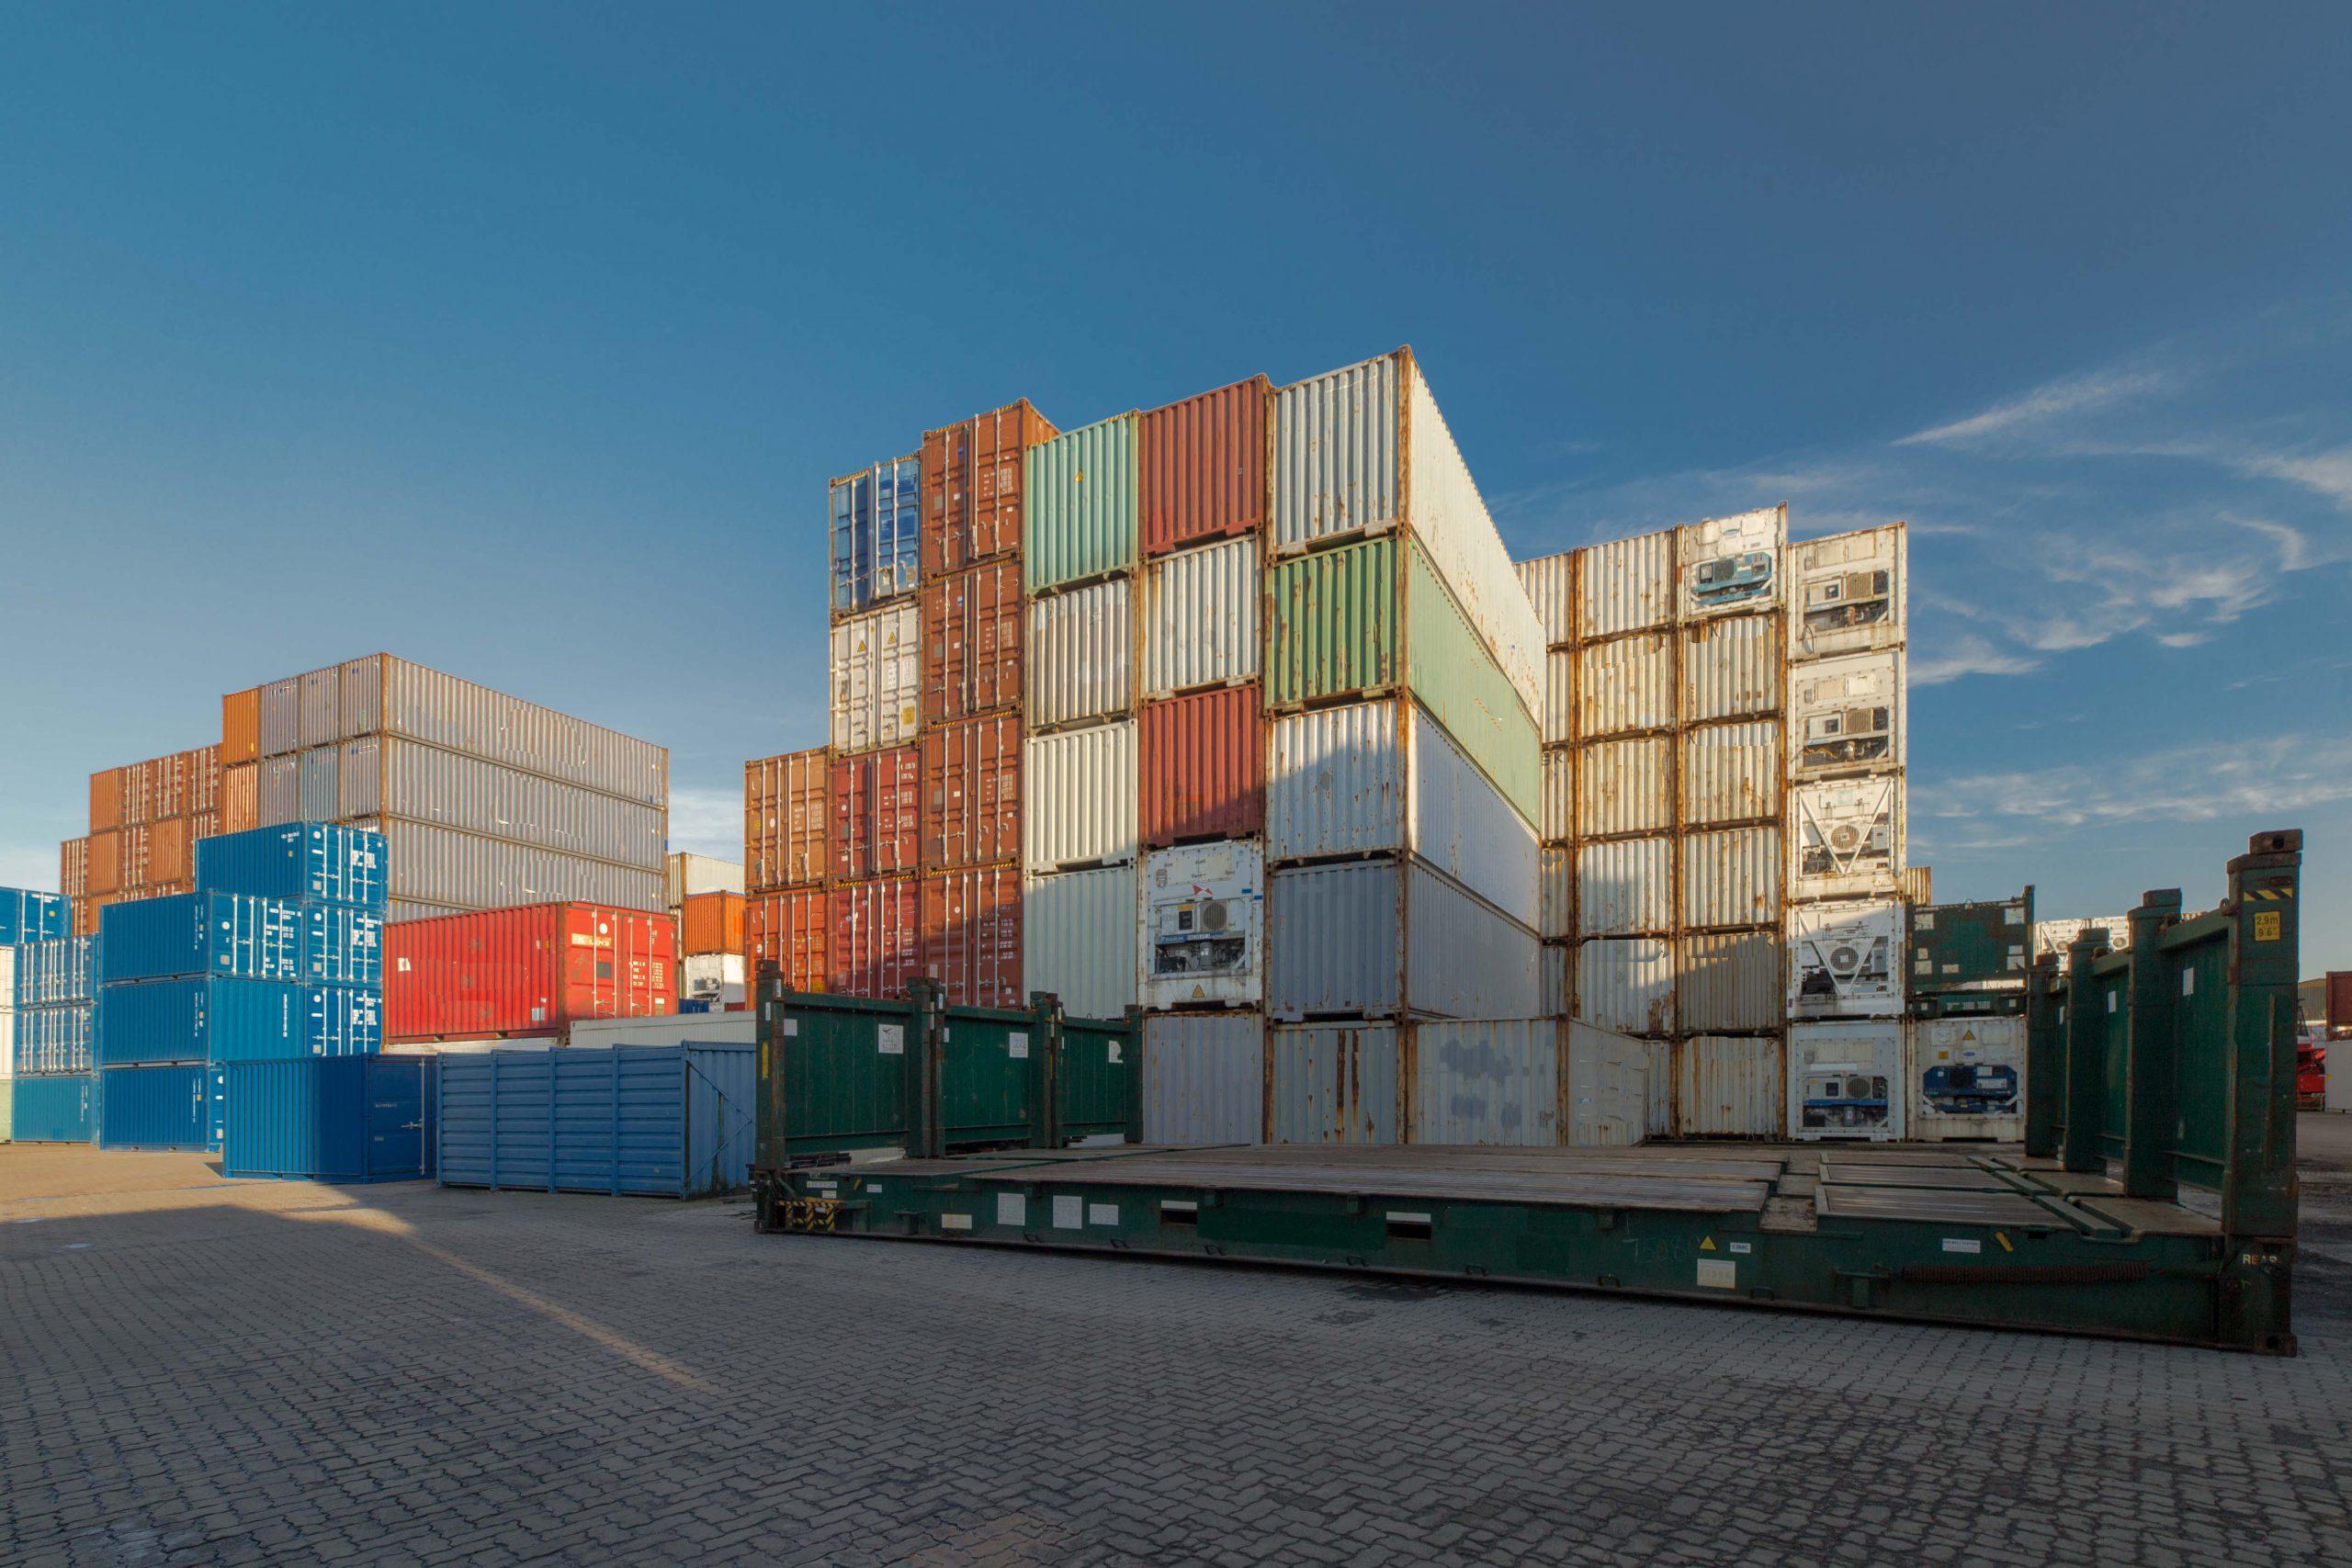 20 Fuß Container,40 Fuß Container,Lagercontainer